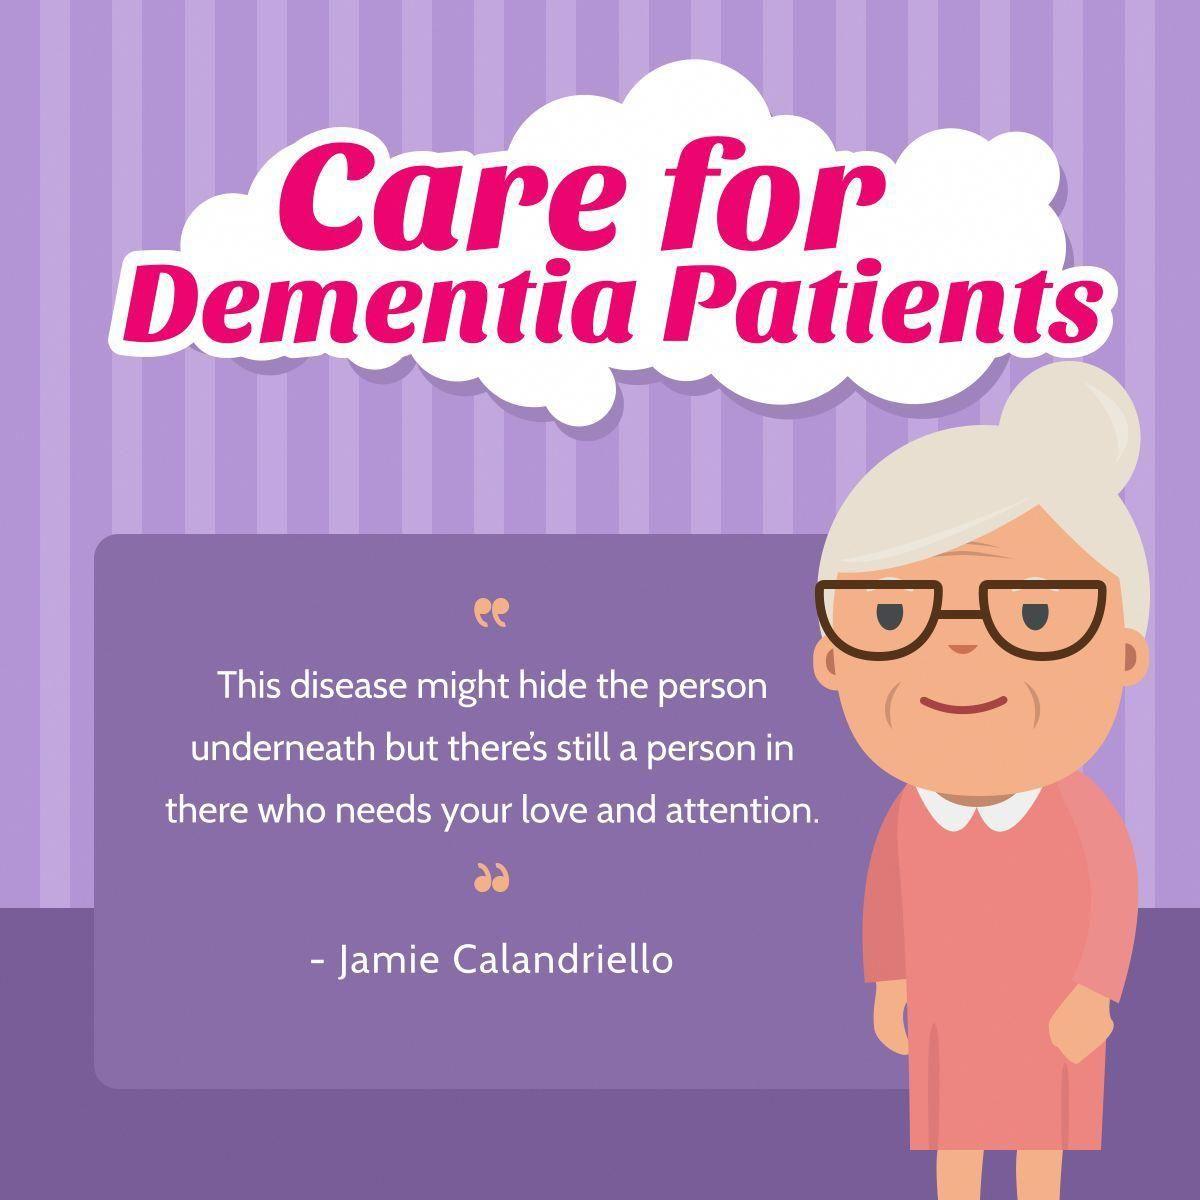 Care for Dementia Patients SeniorCare Dementia